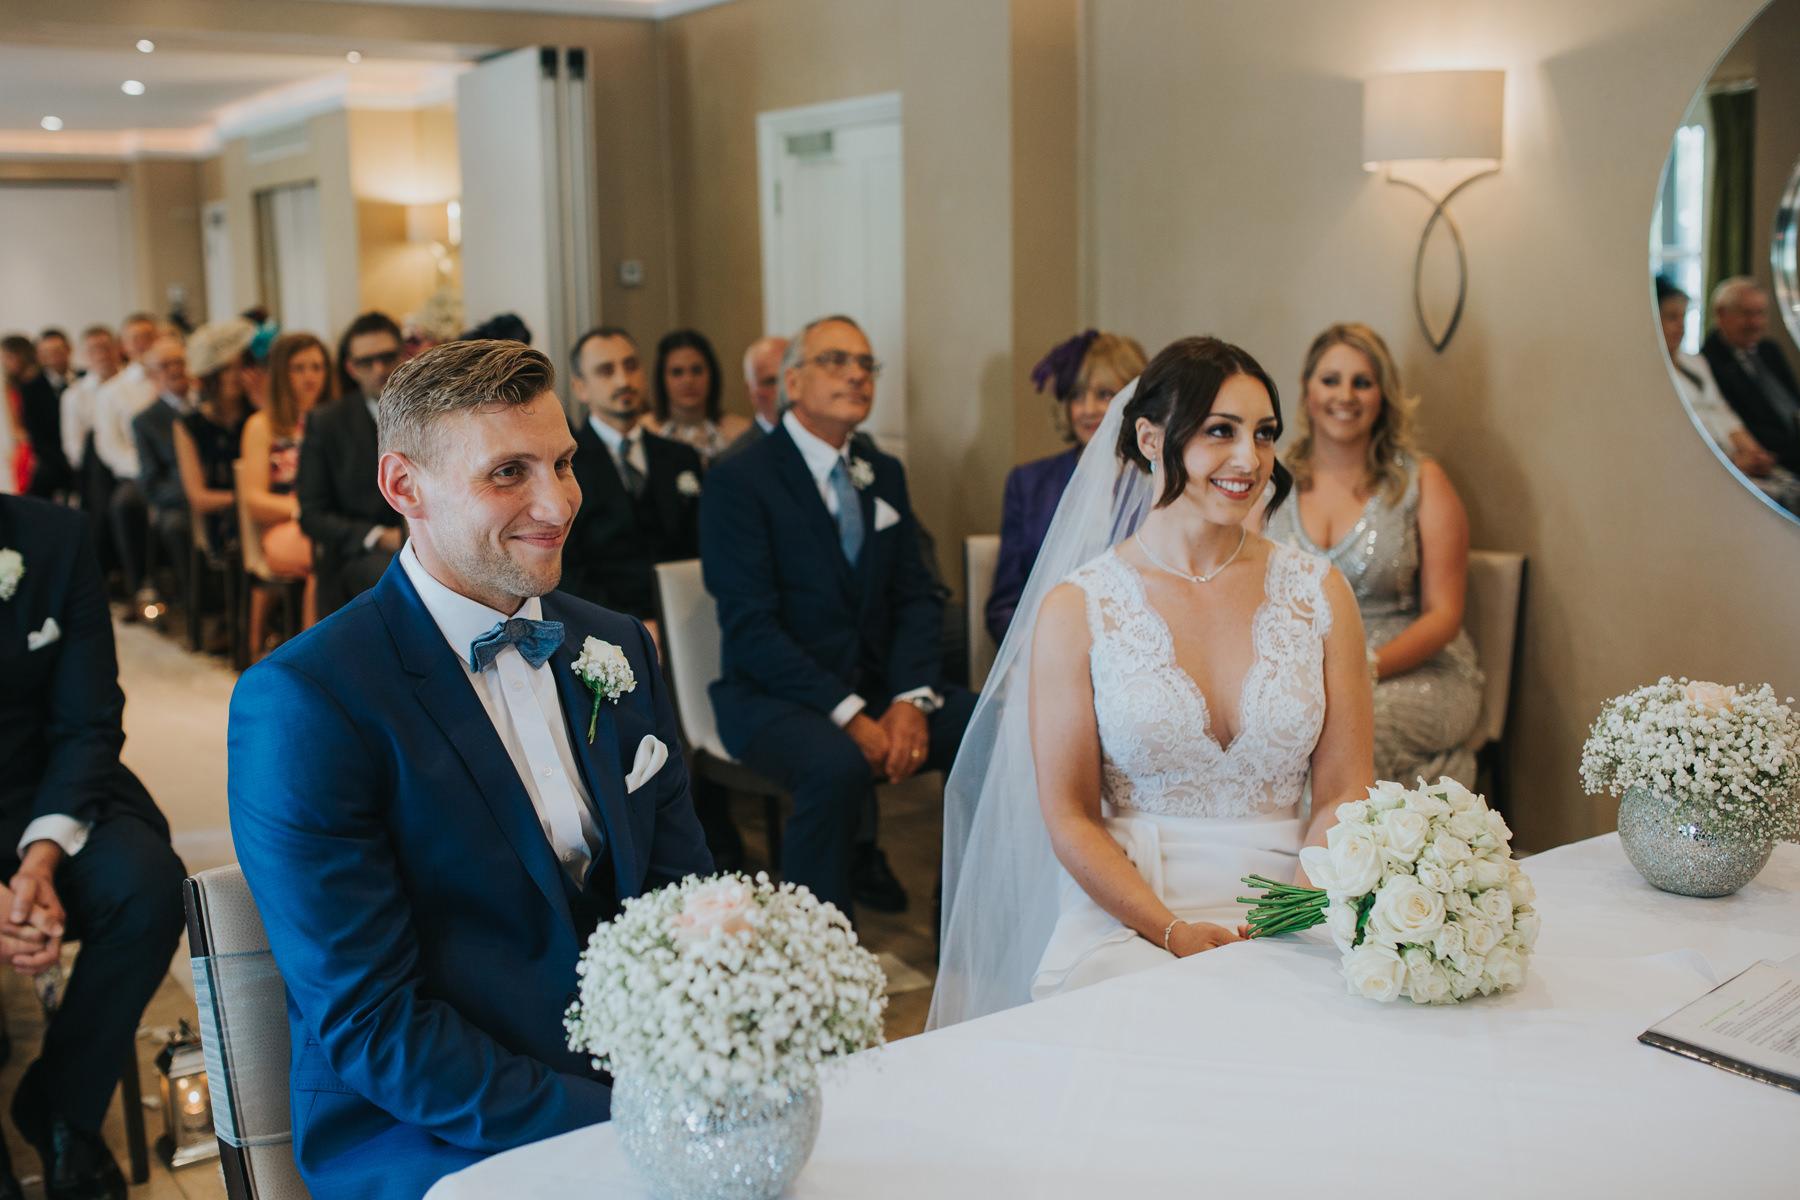 The Bingham Wedding Photographer London--groom bride marriage ceremony-CRL-141.jpg